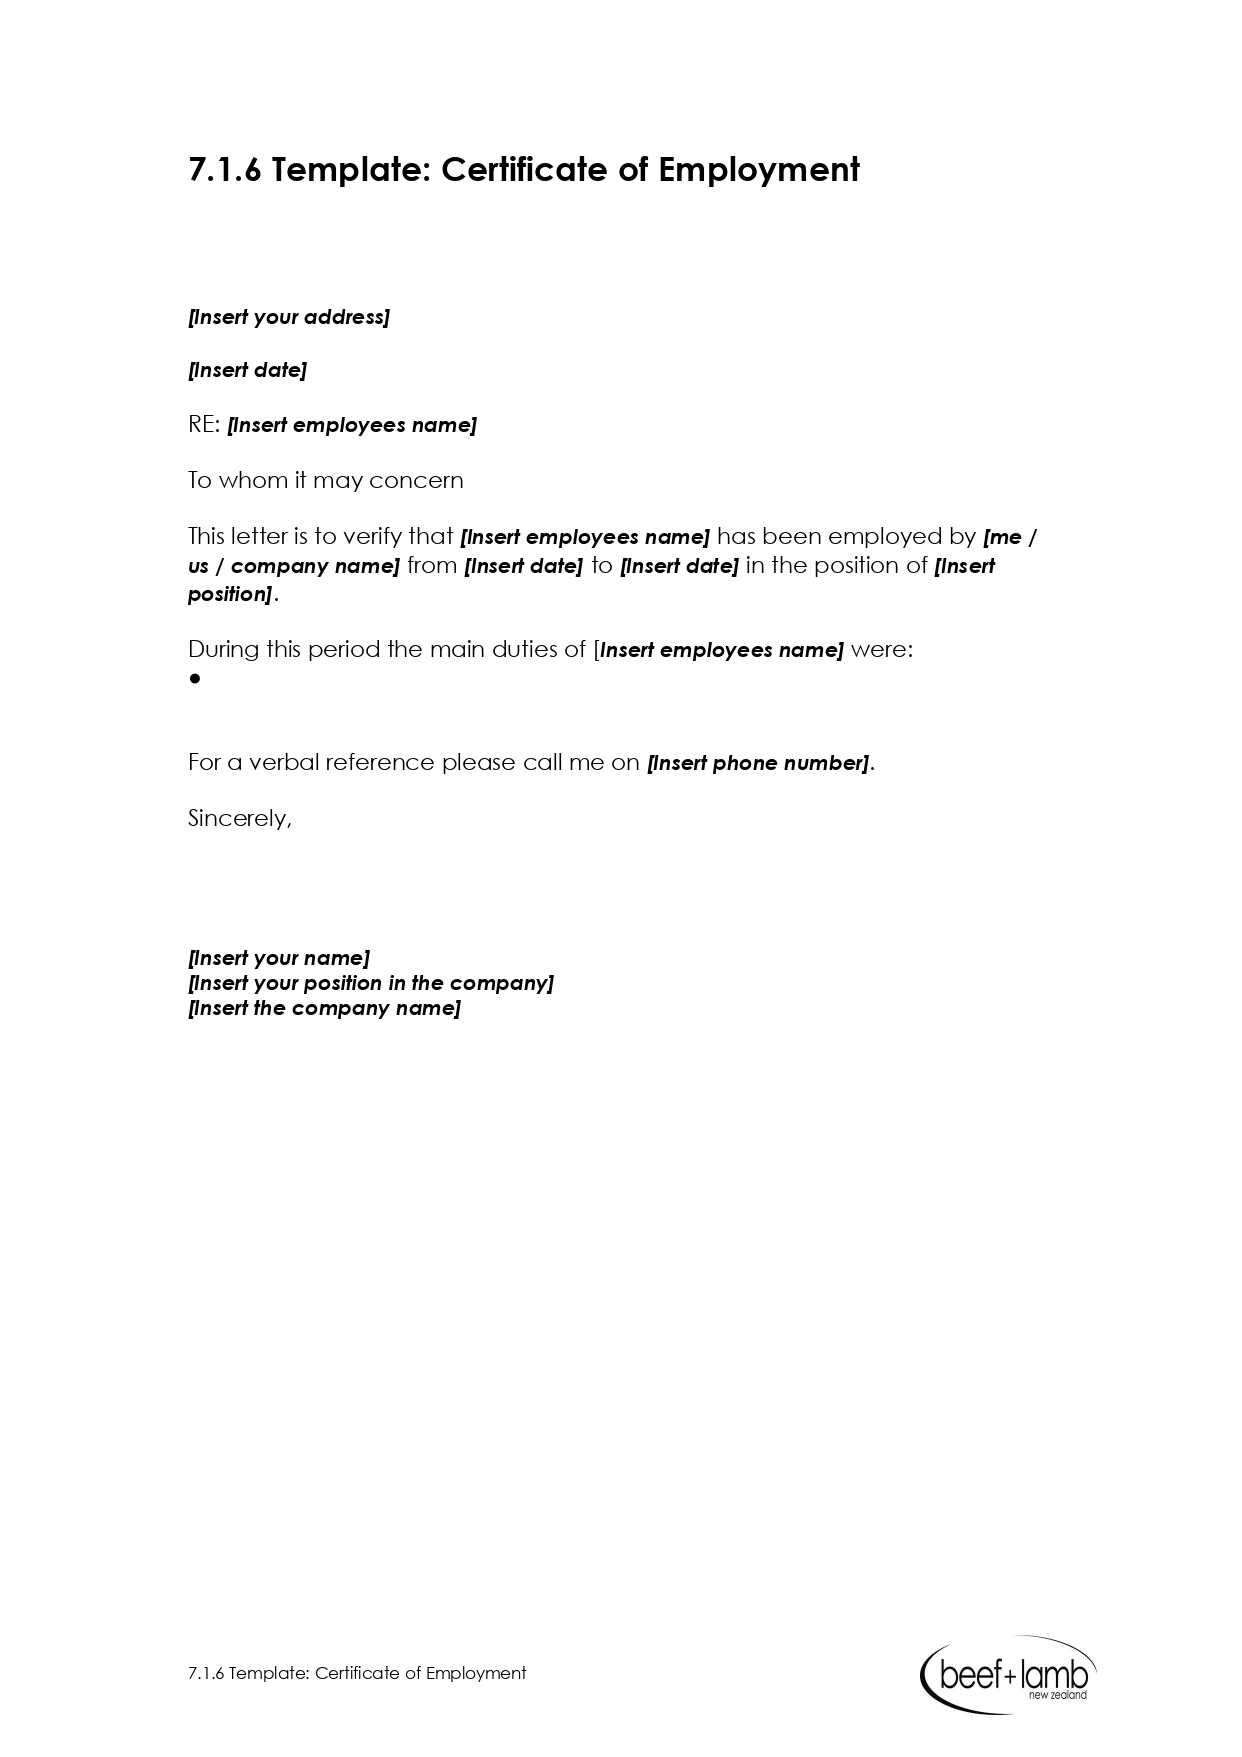 Editable Certificate Of Employment Template - Google Docs Regarding Sample Certificate Employment Template